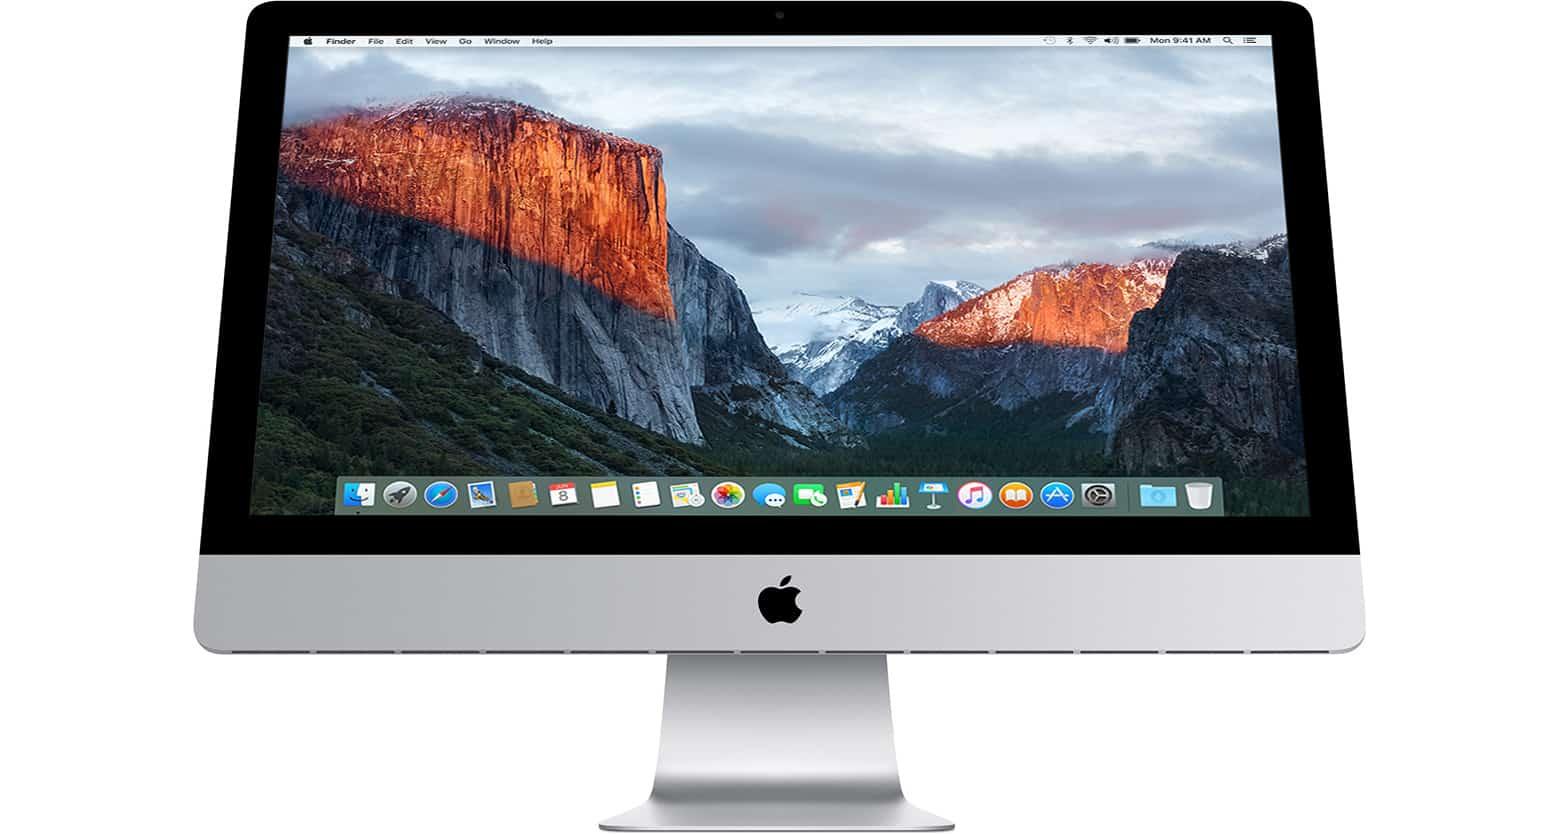 How To Fix Error Code 36 For Mac - The Error Code Pros